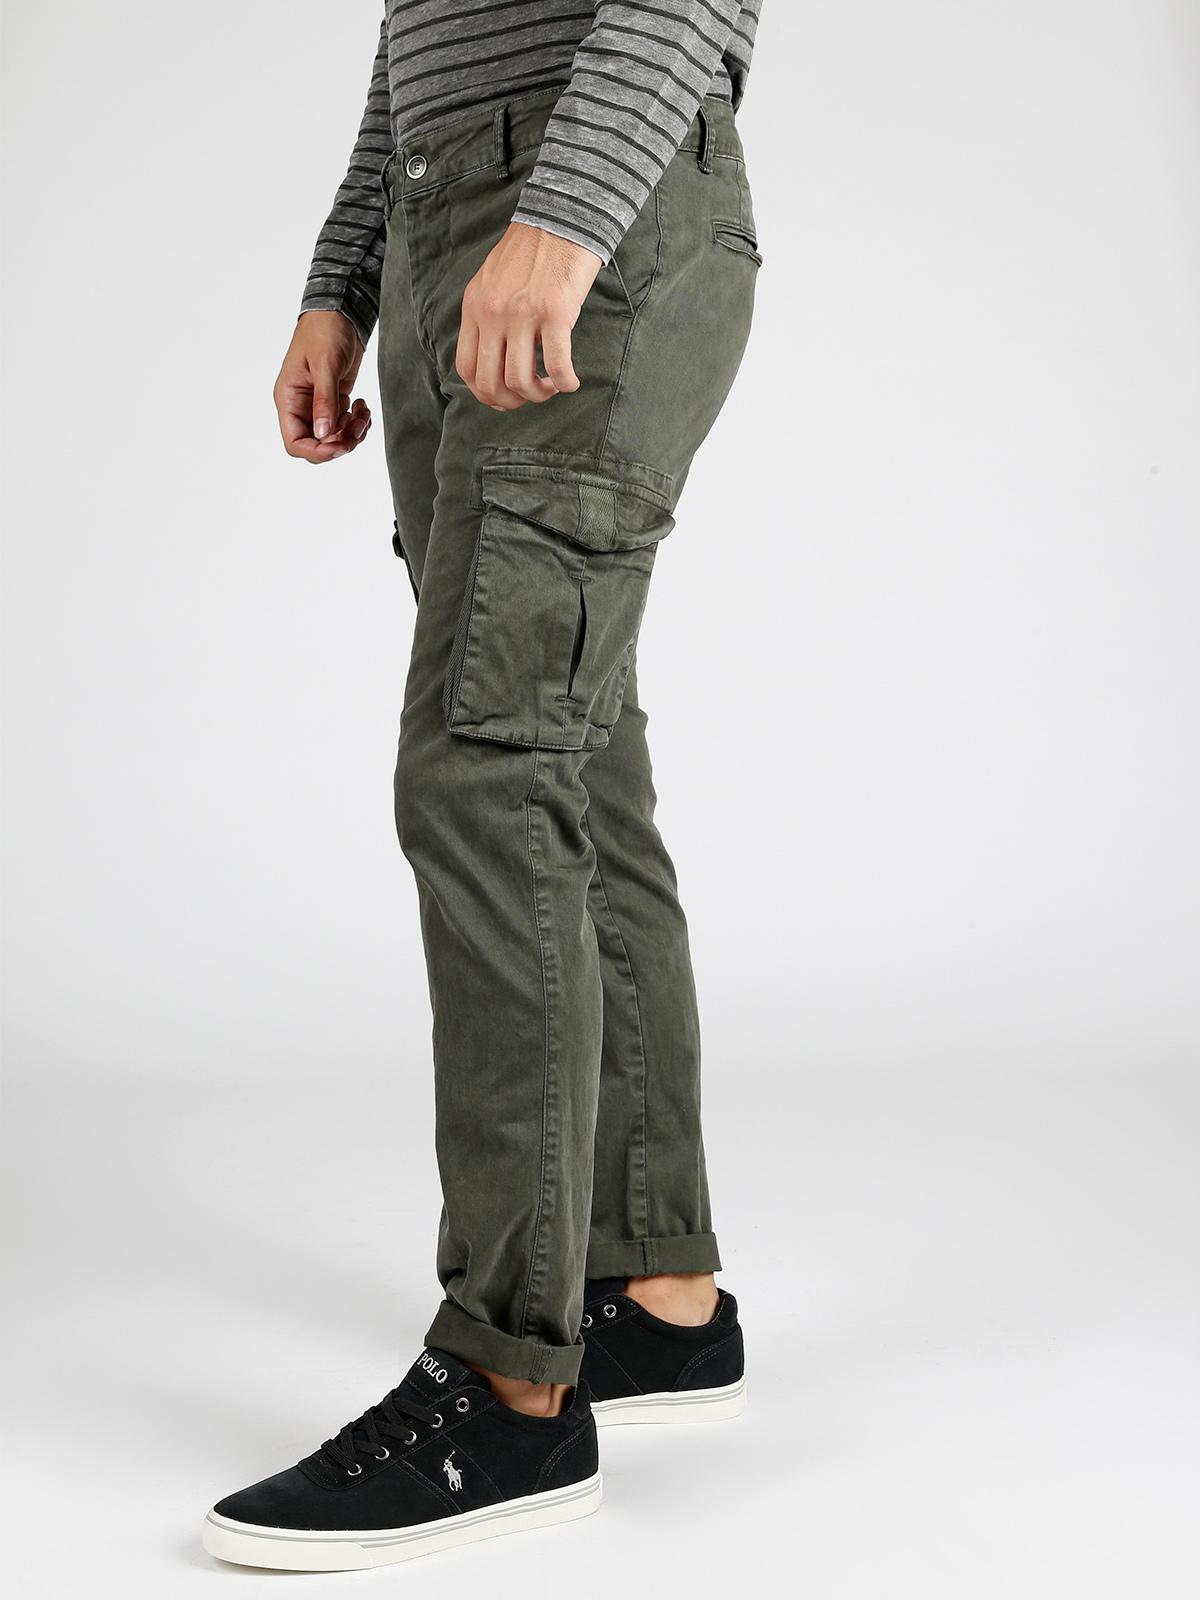 Pantaloni cargo in cotone verde militare s&t 99 | MecShopping